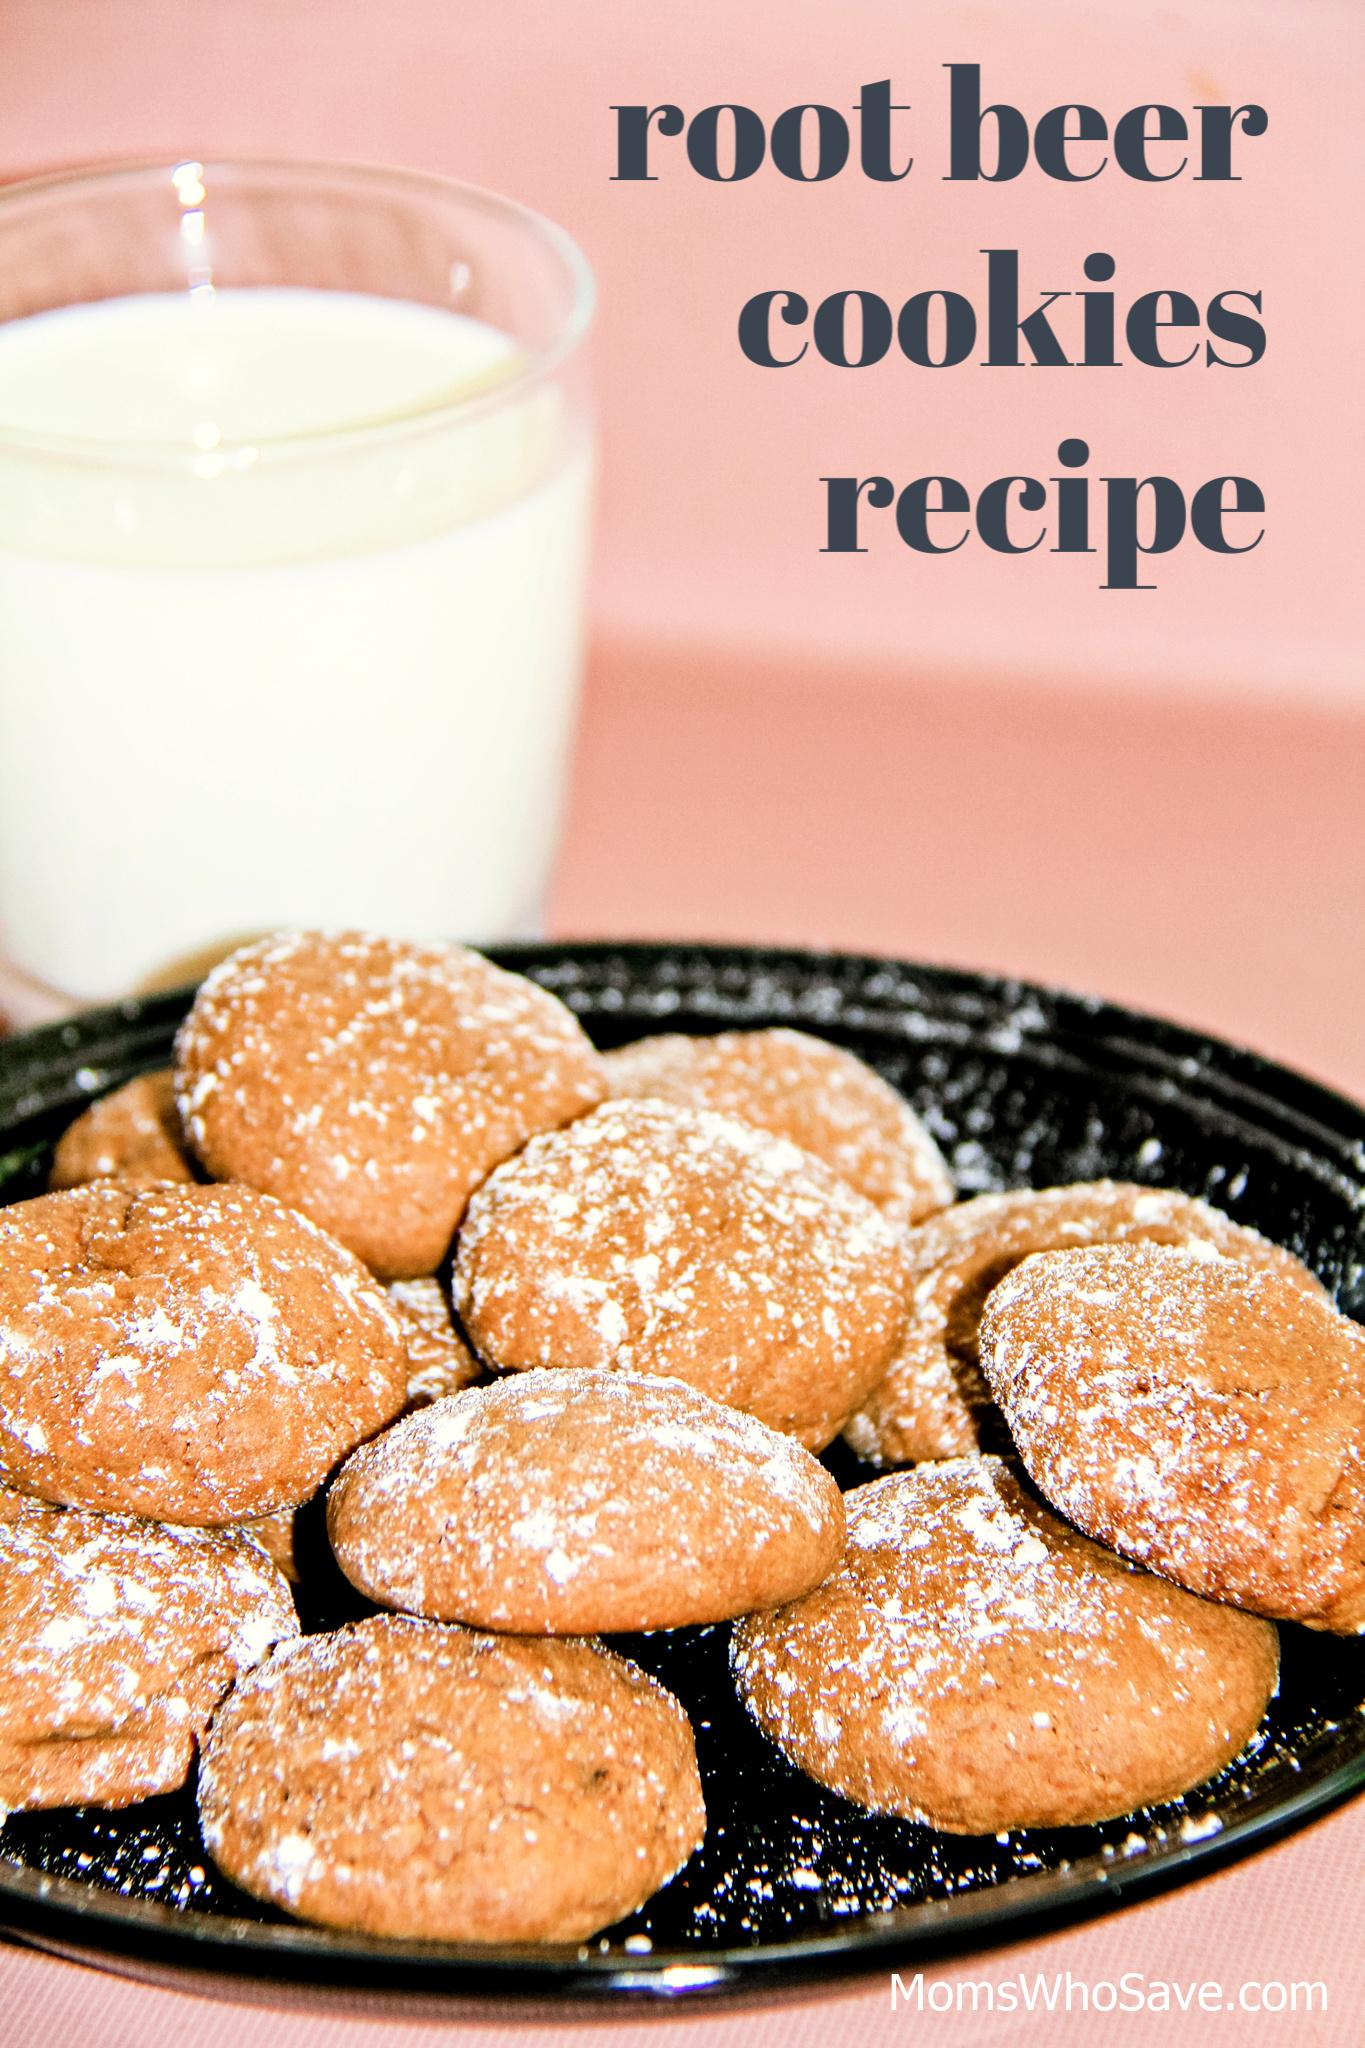 root beer cookies recipe